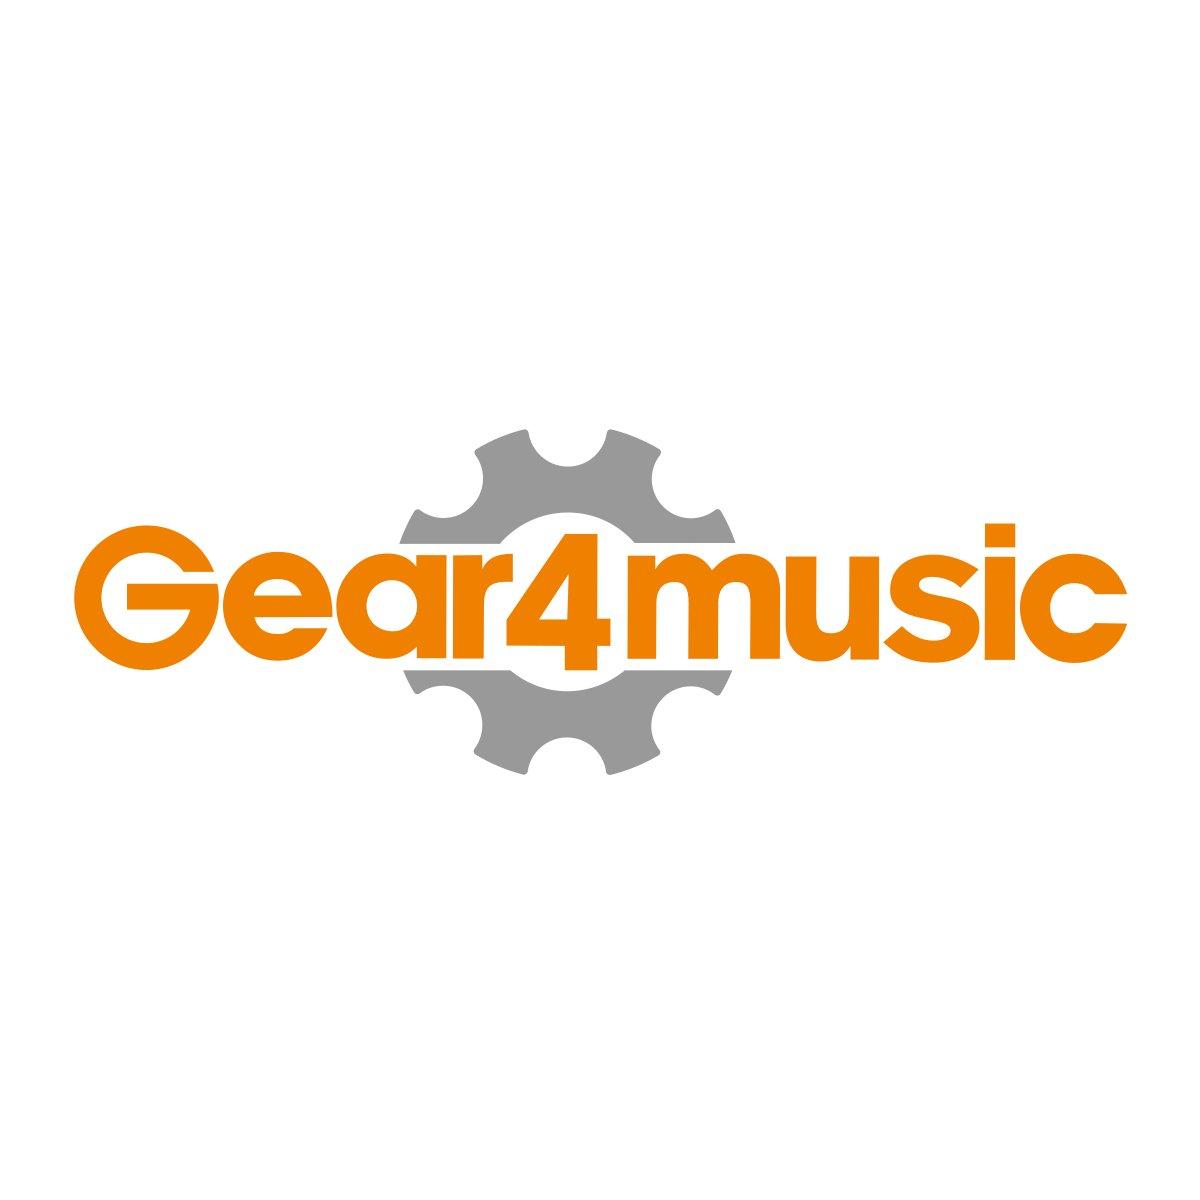 Remo Standard Buffalo Drum 3.5\'\' x 14\'\', White bei Gear4music